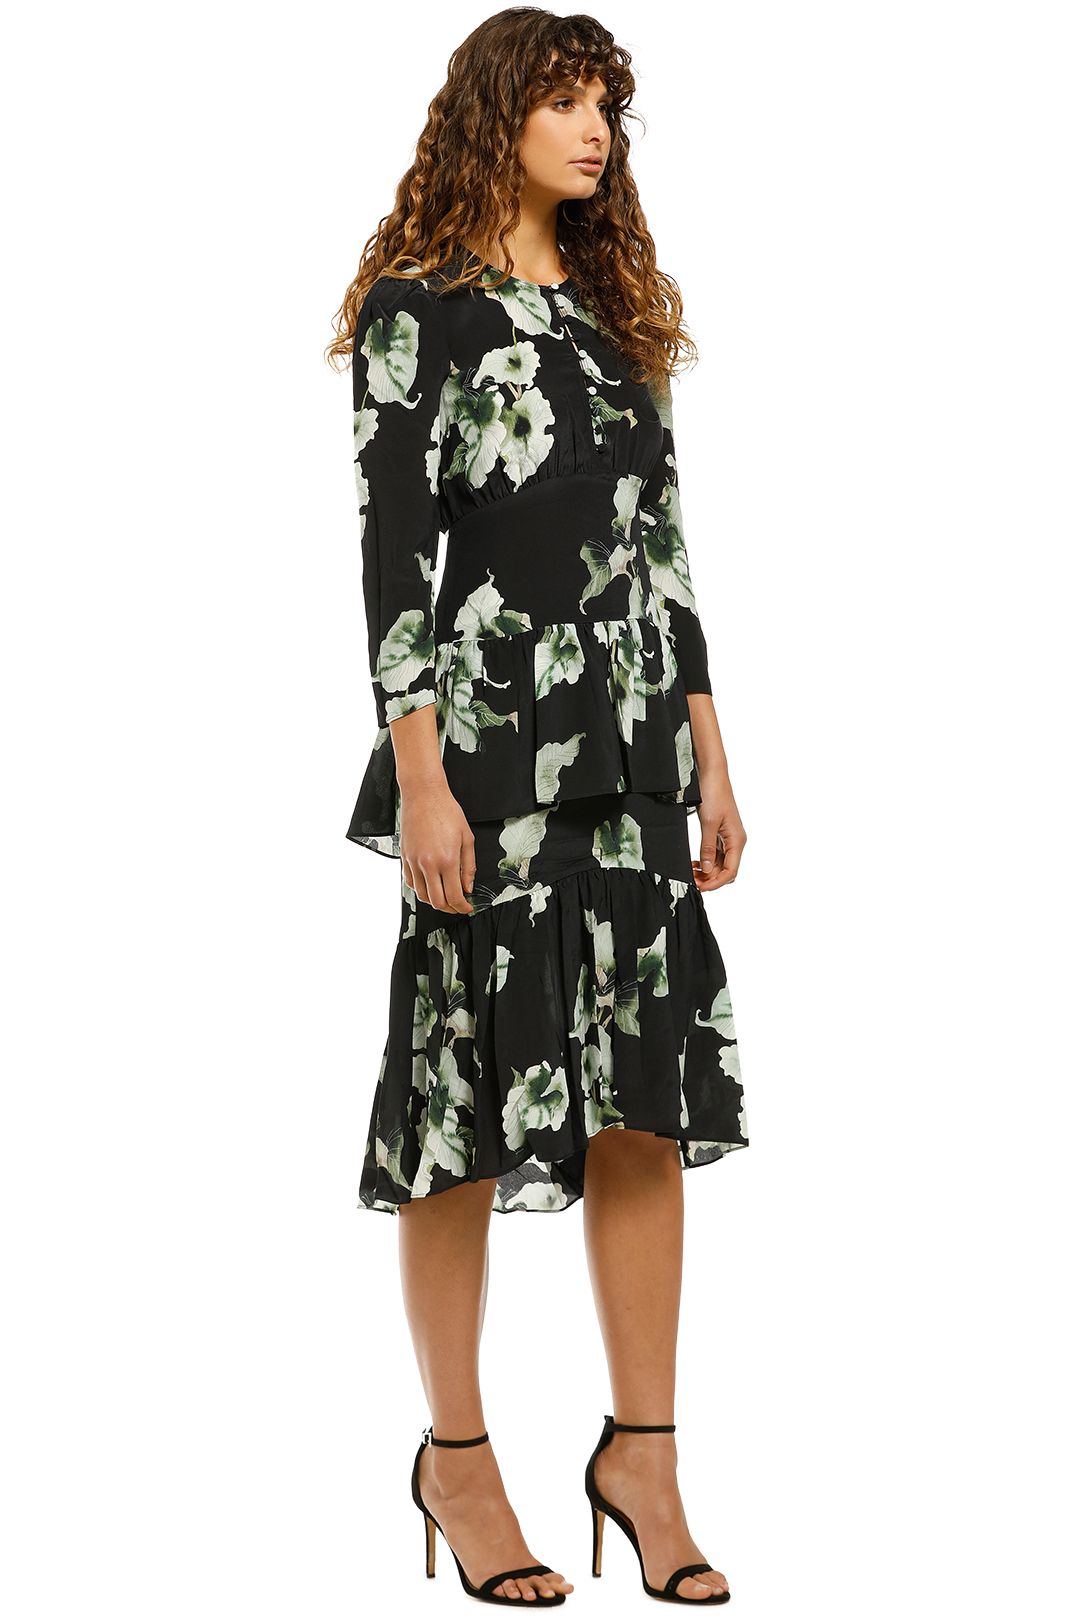 Husk-Amazon-Dress-Leaf-Print-Side